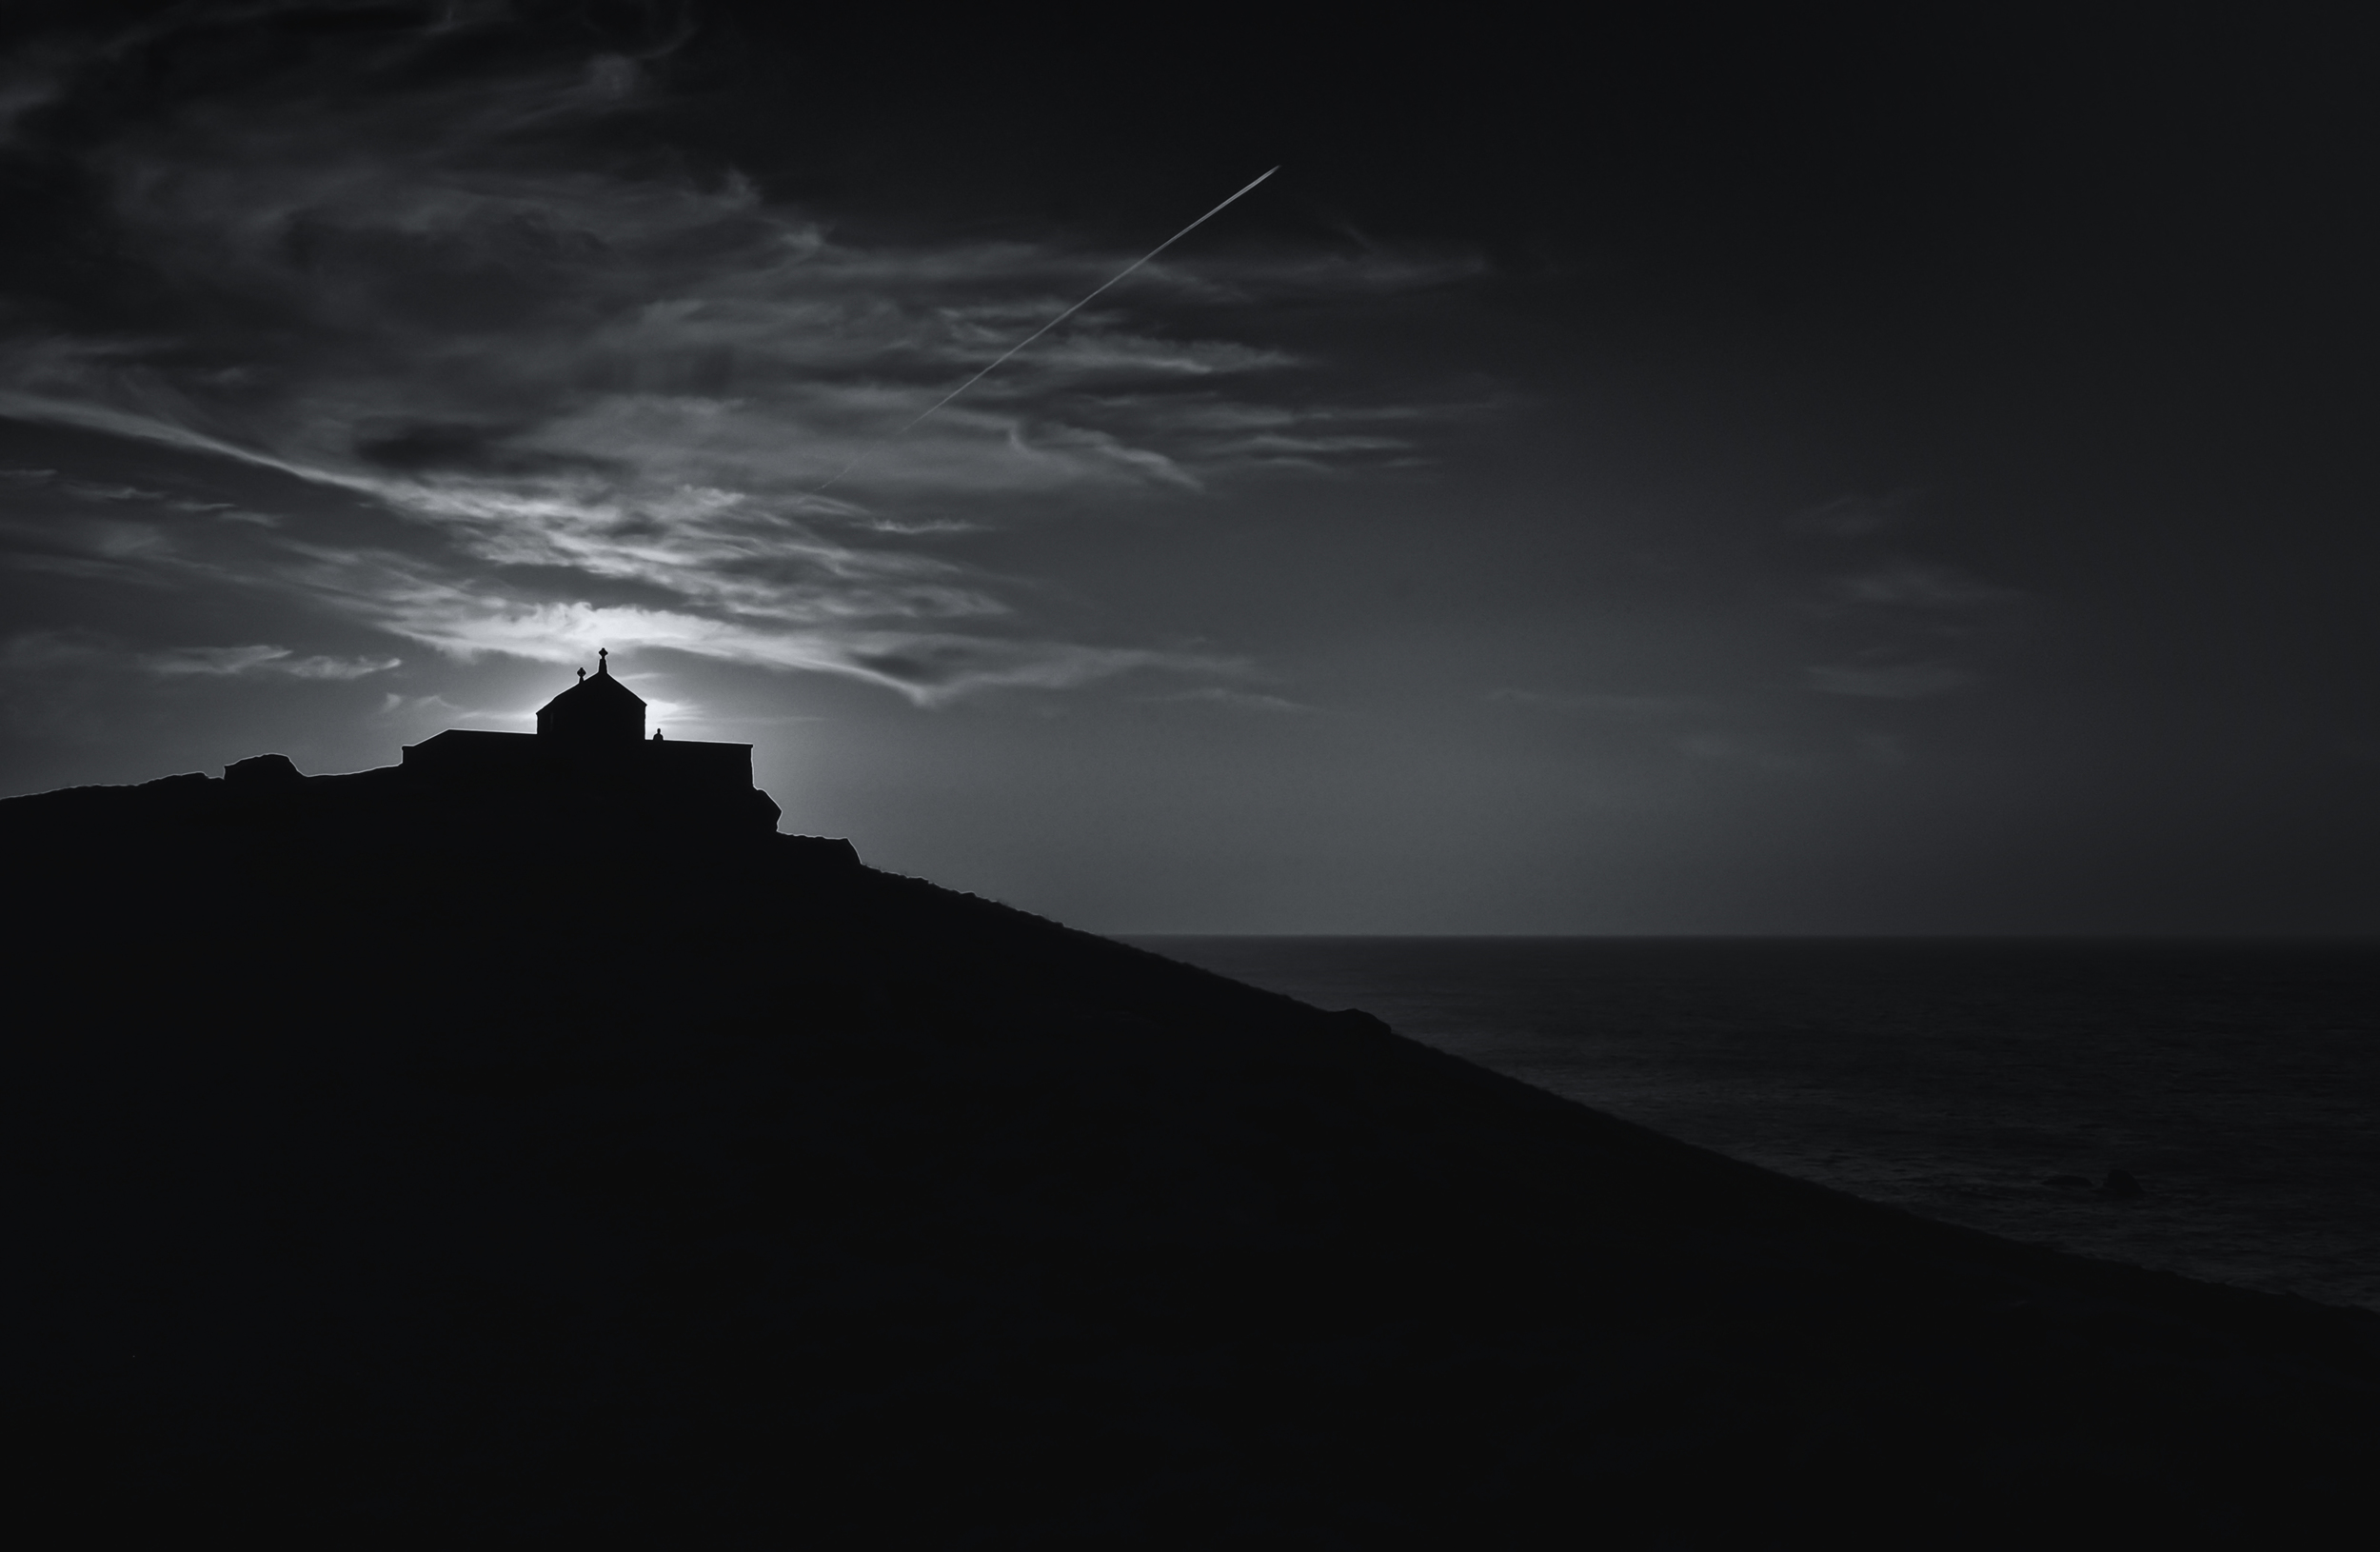 Adieu   St. Ives, Cornwall, England